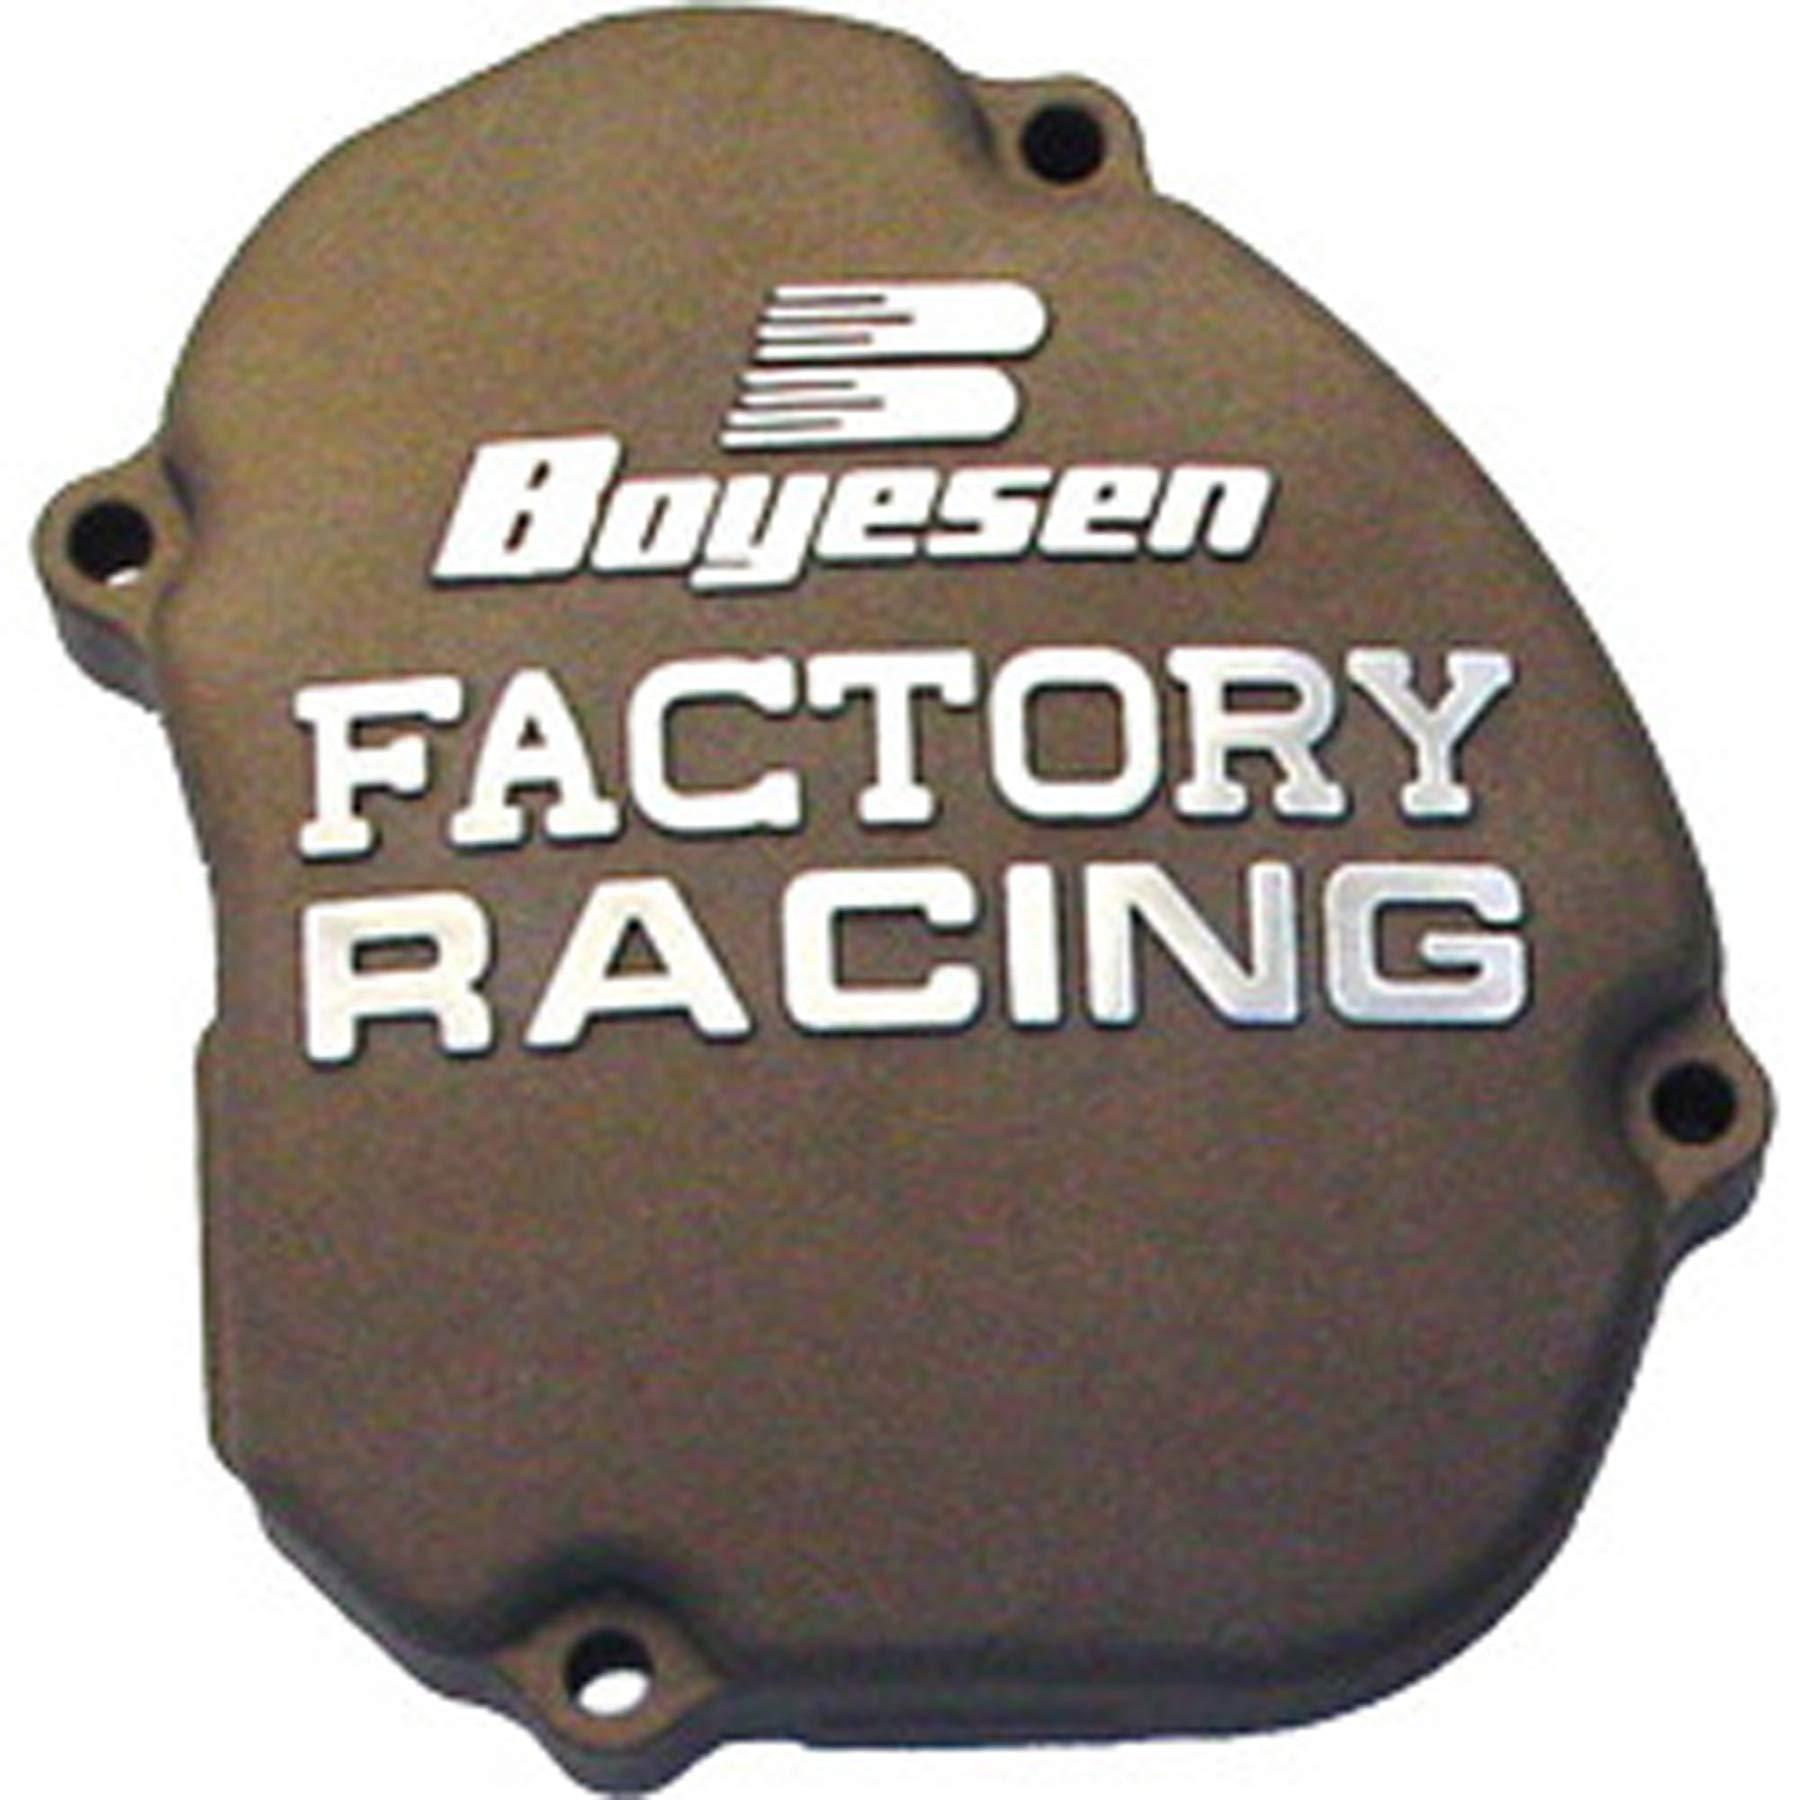 Factory Ignition Cover - Magnesium 2006 Kawasaki KX250 Offroad Motorcycle